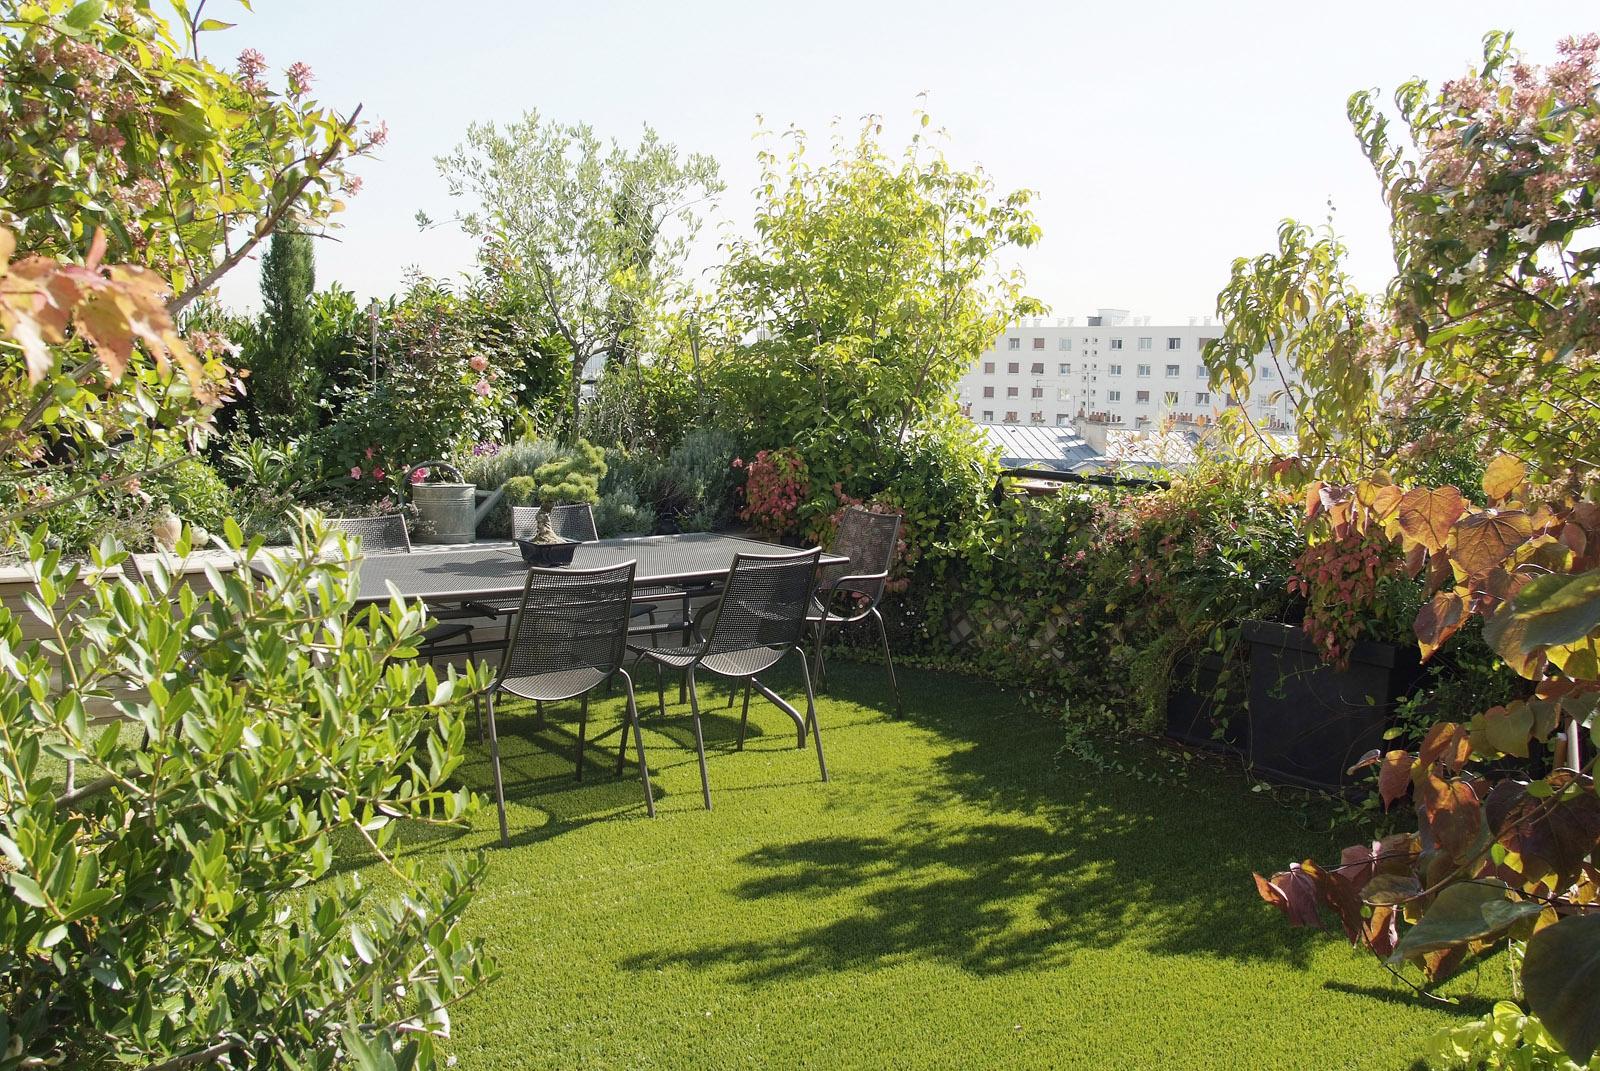 Terrasses horticulture et jardins - Amenagement terrasse et jardin photo ...